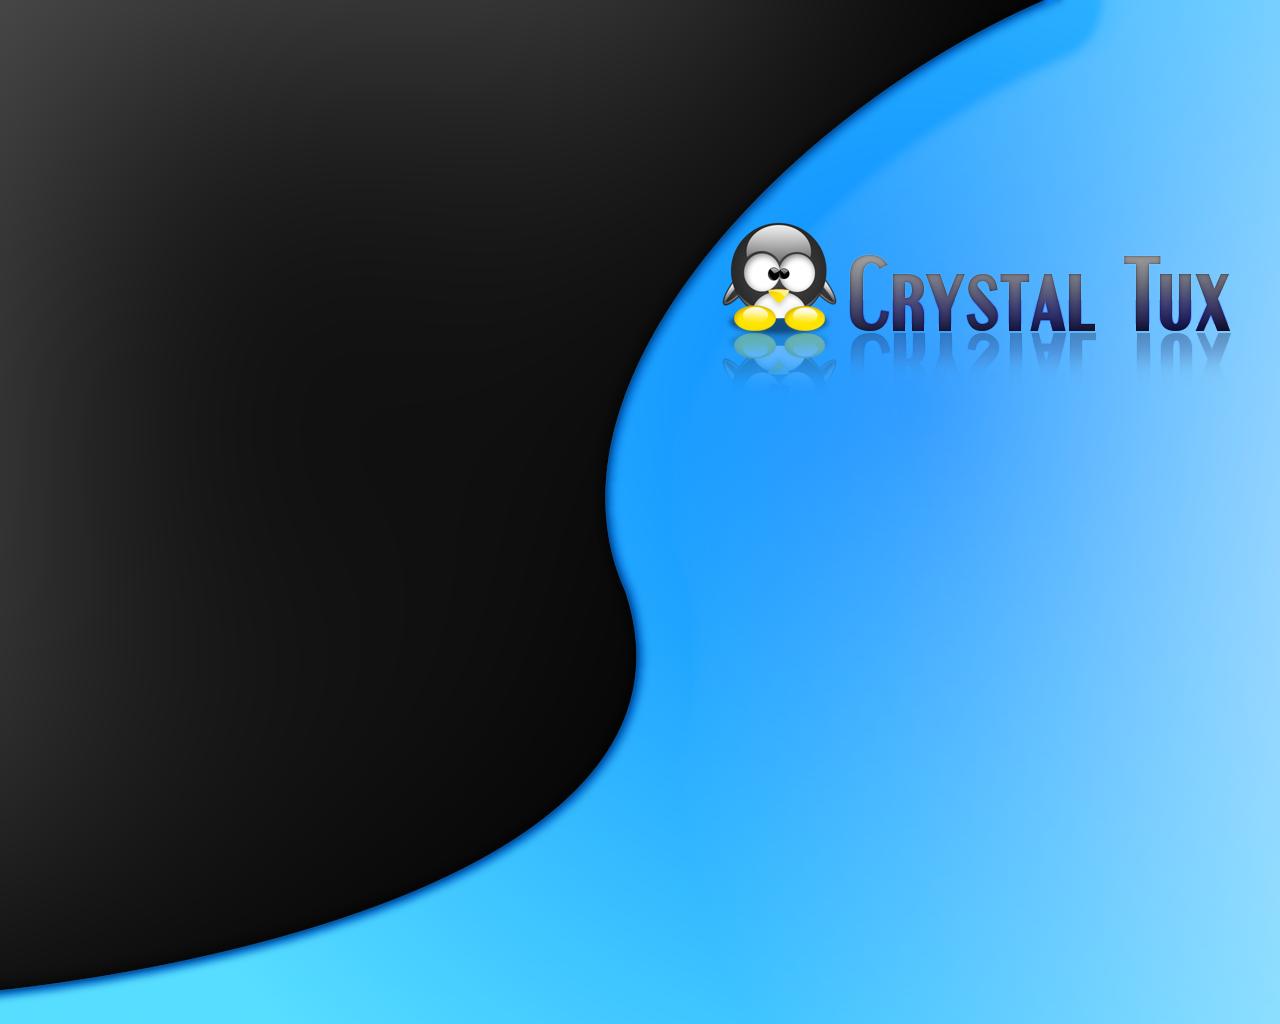 Crystal tux